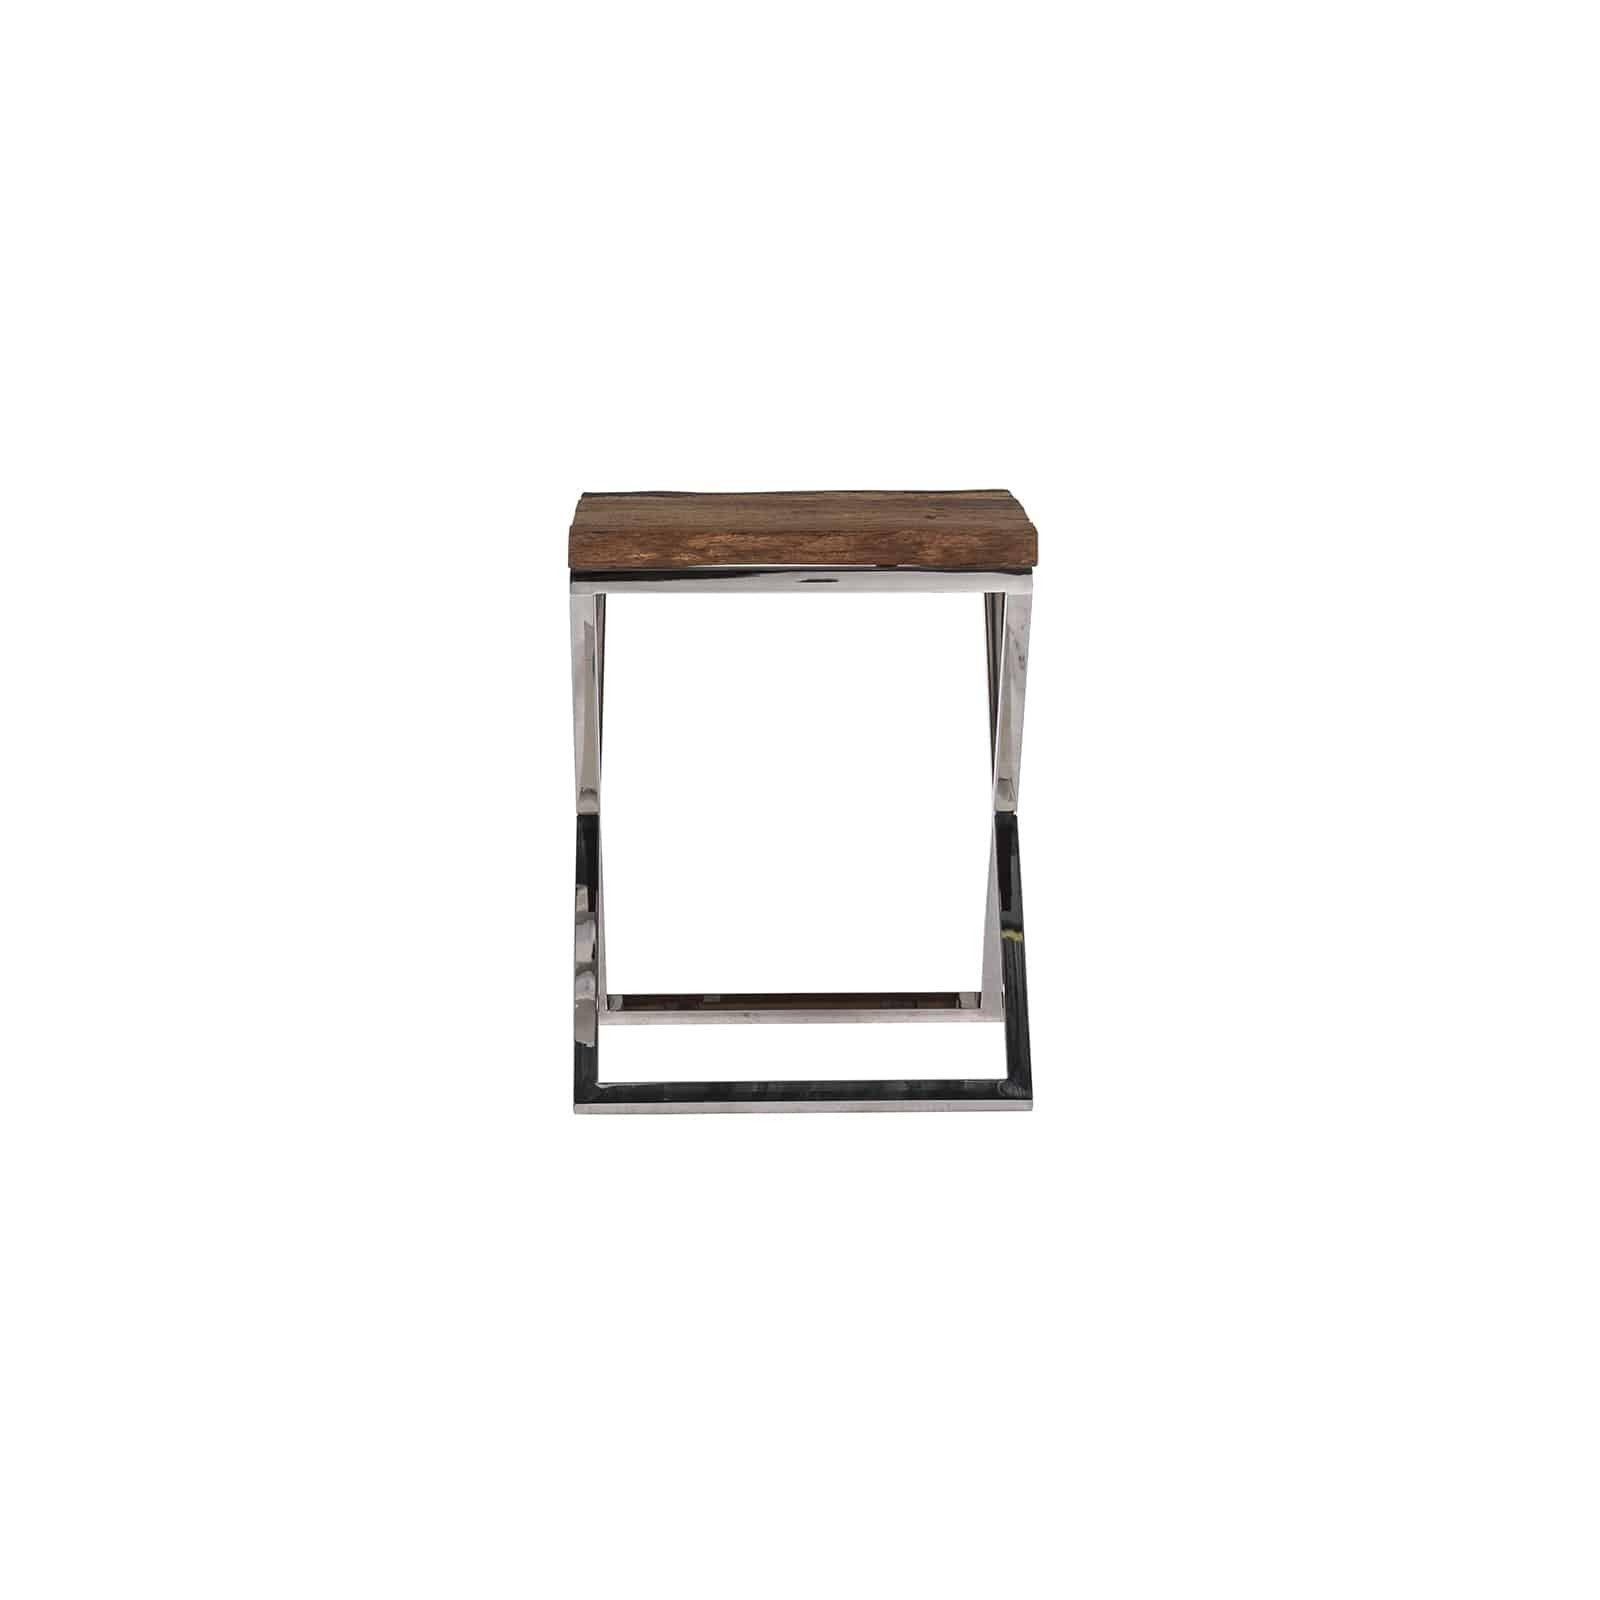 Table d'angle Kensington 45x45 Meuble Déco Tendance - 75